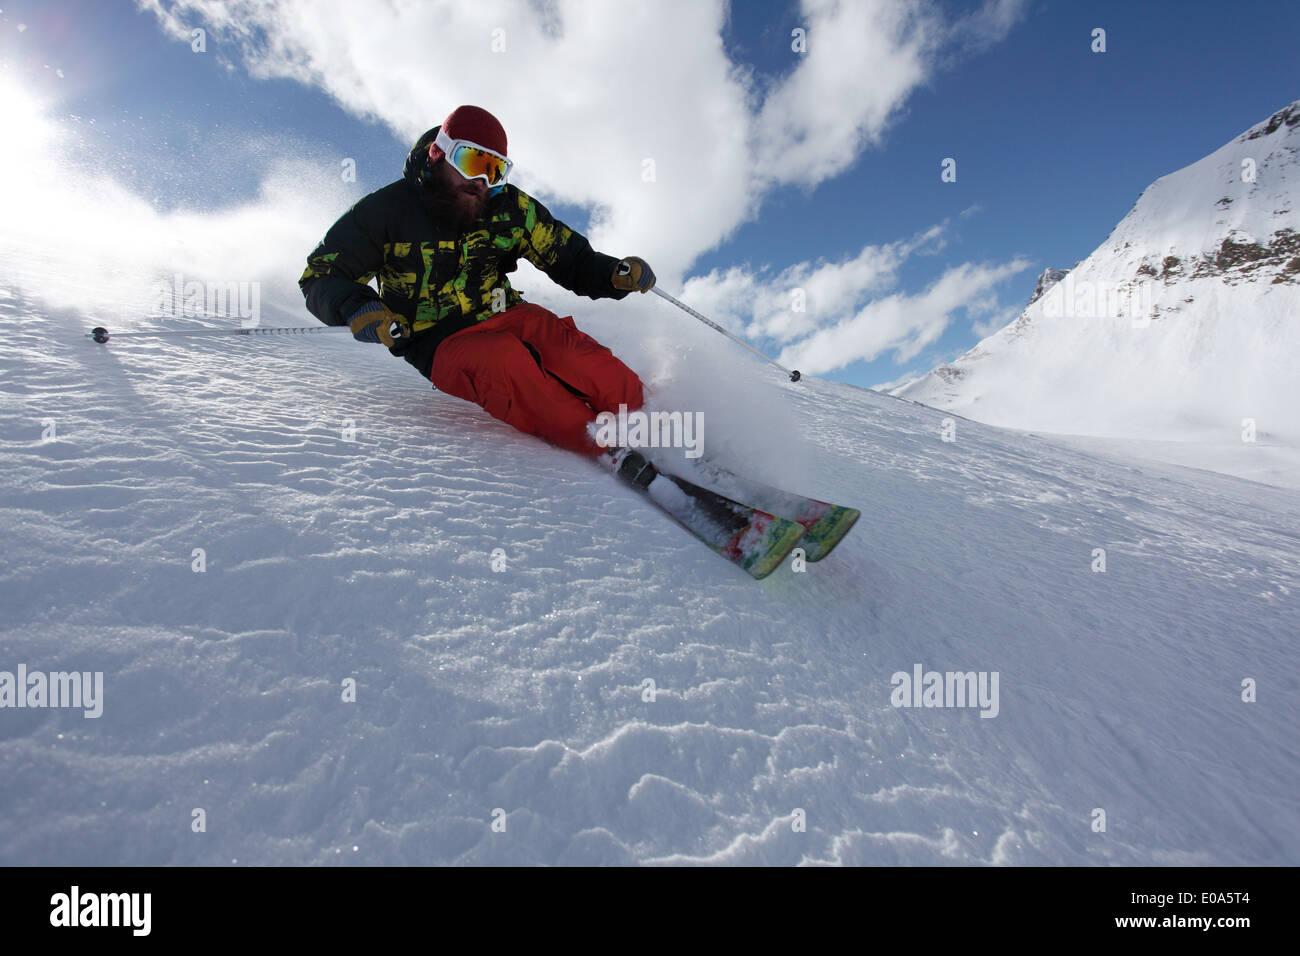 Mid adult man skiing at speed downhill, Mayrhofen, Tyrol, Austria Stock Photo